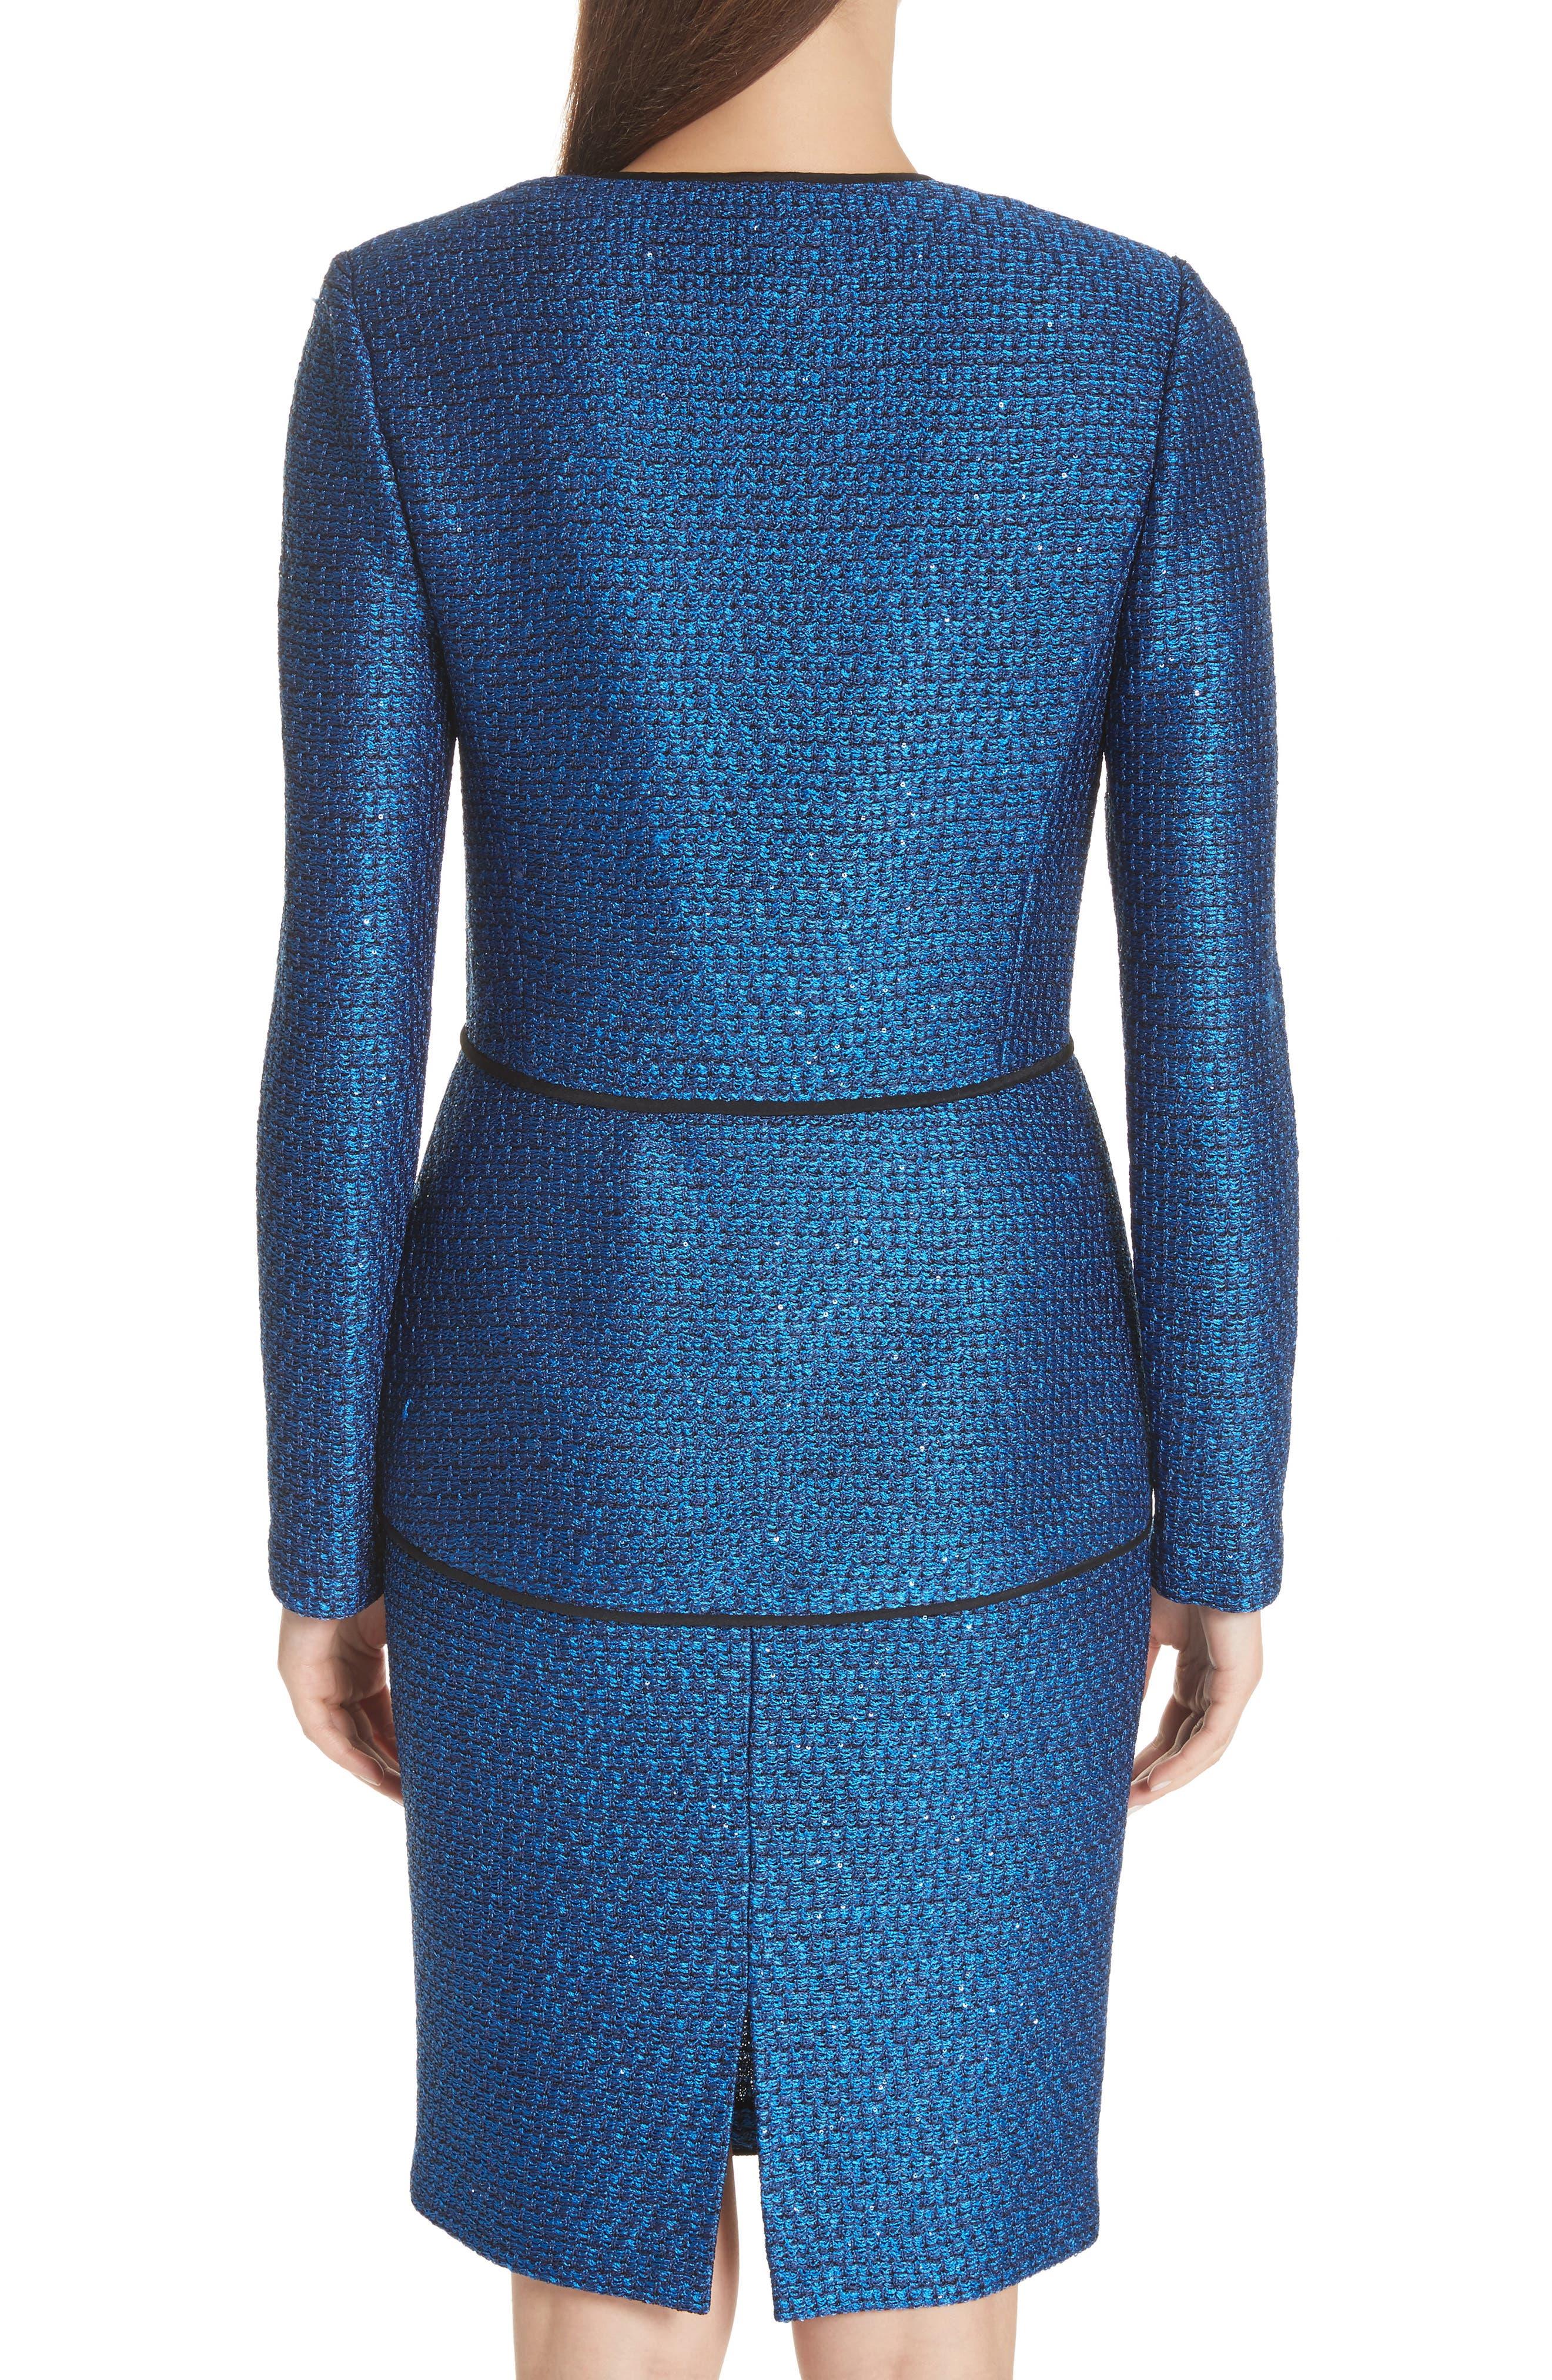 Luster Sequin Knit Jacket,                             Alternate thumbnail 2, color,                             COBALT MULTI